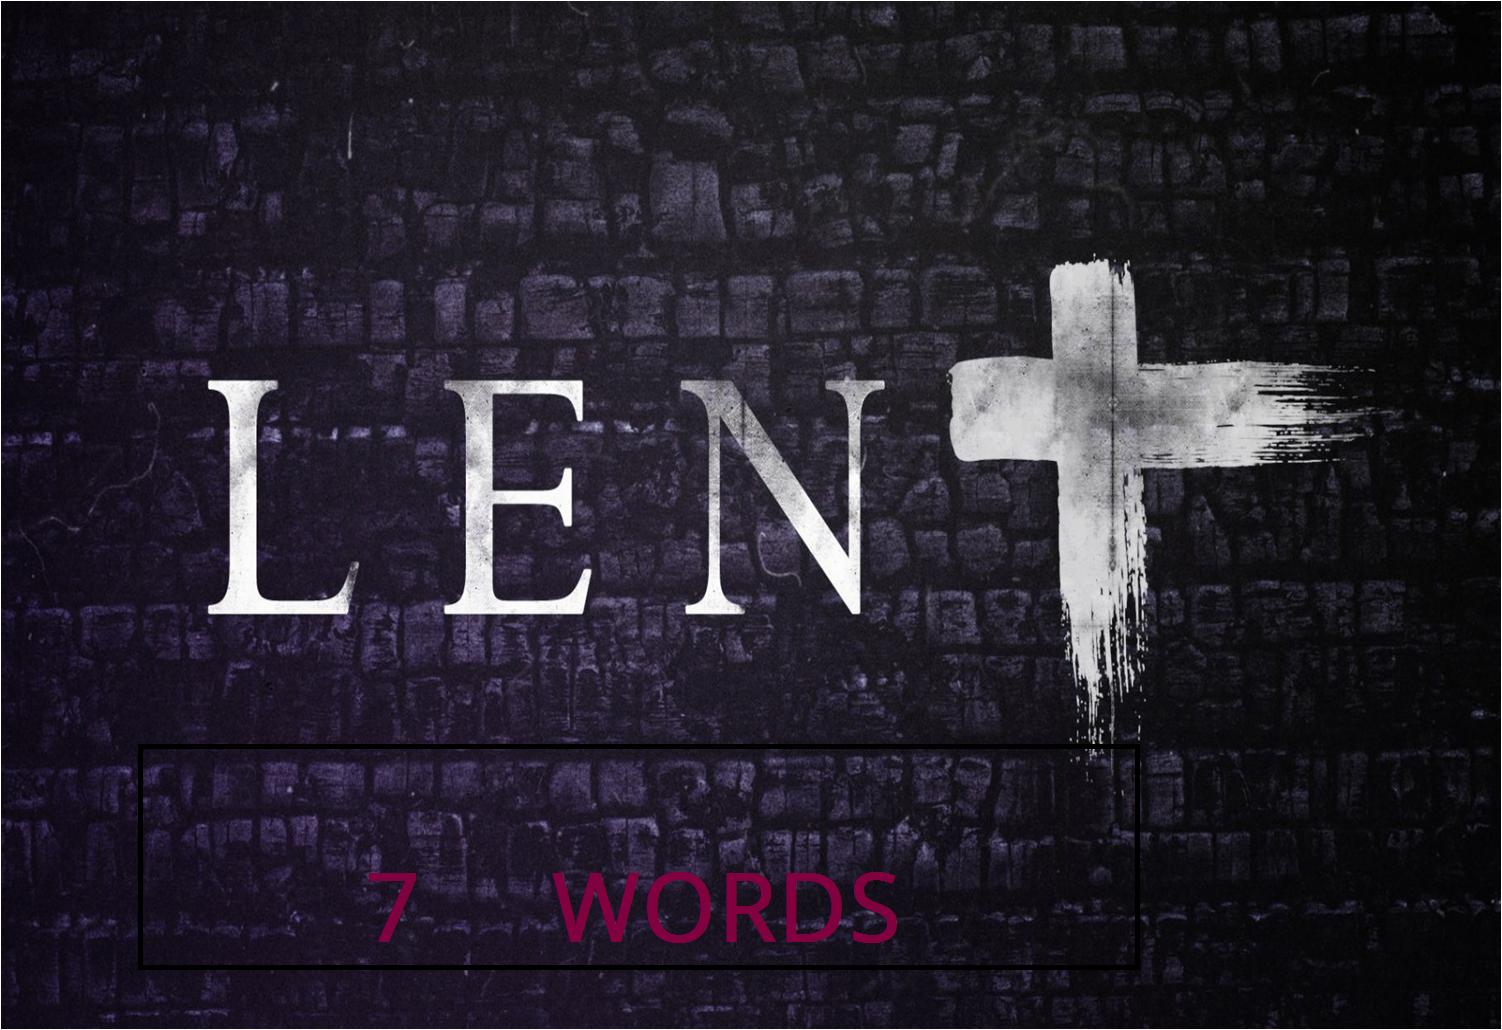 Lent 7 Words.png